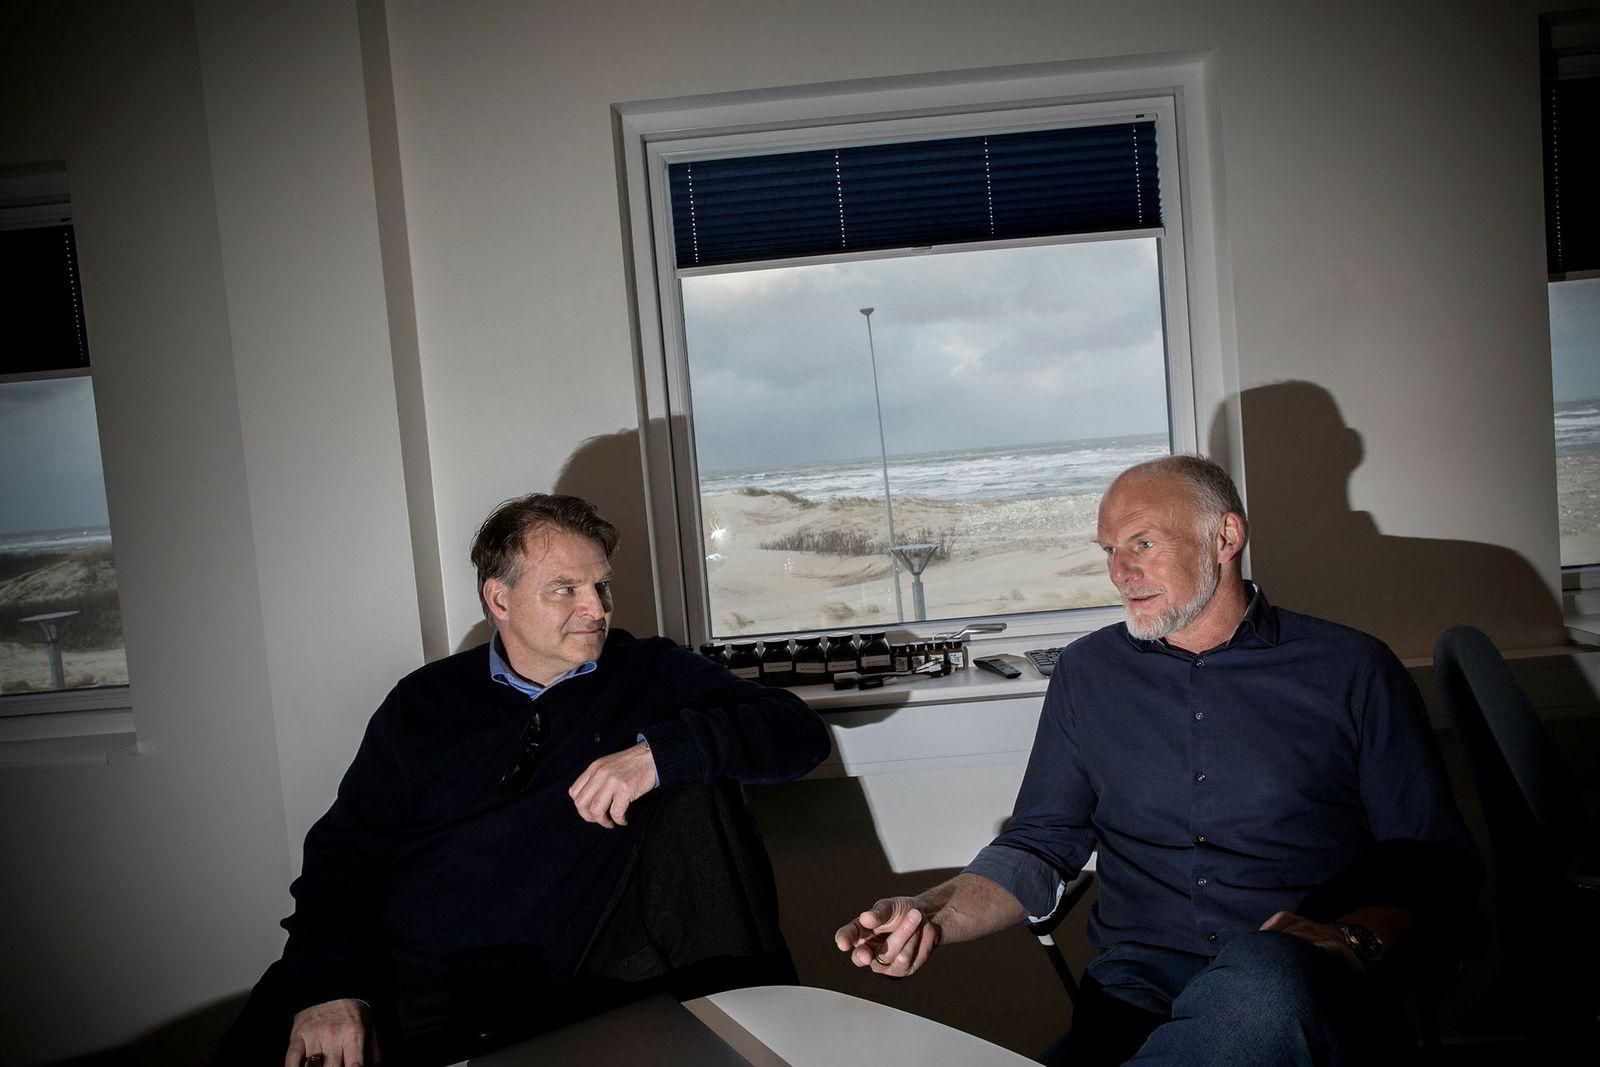 Styreleder Erik Heim (til venstre) og direktør Claus Rom i Sashimi Royal i Hanstholm.